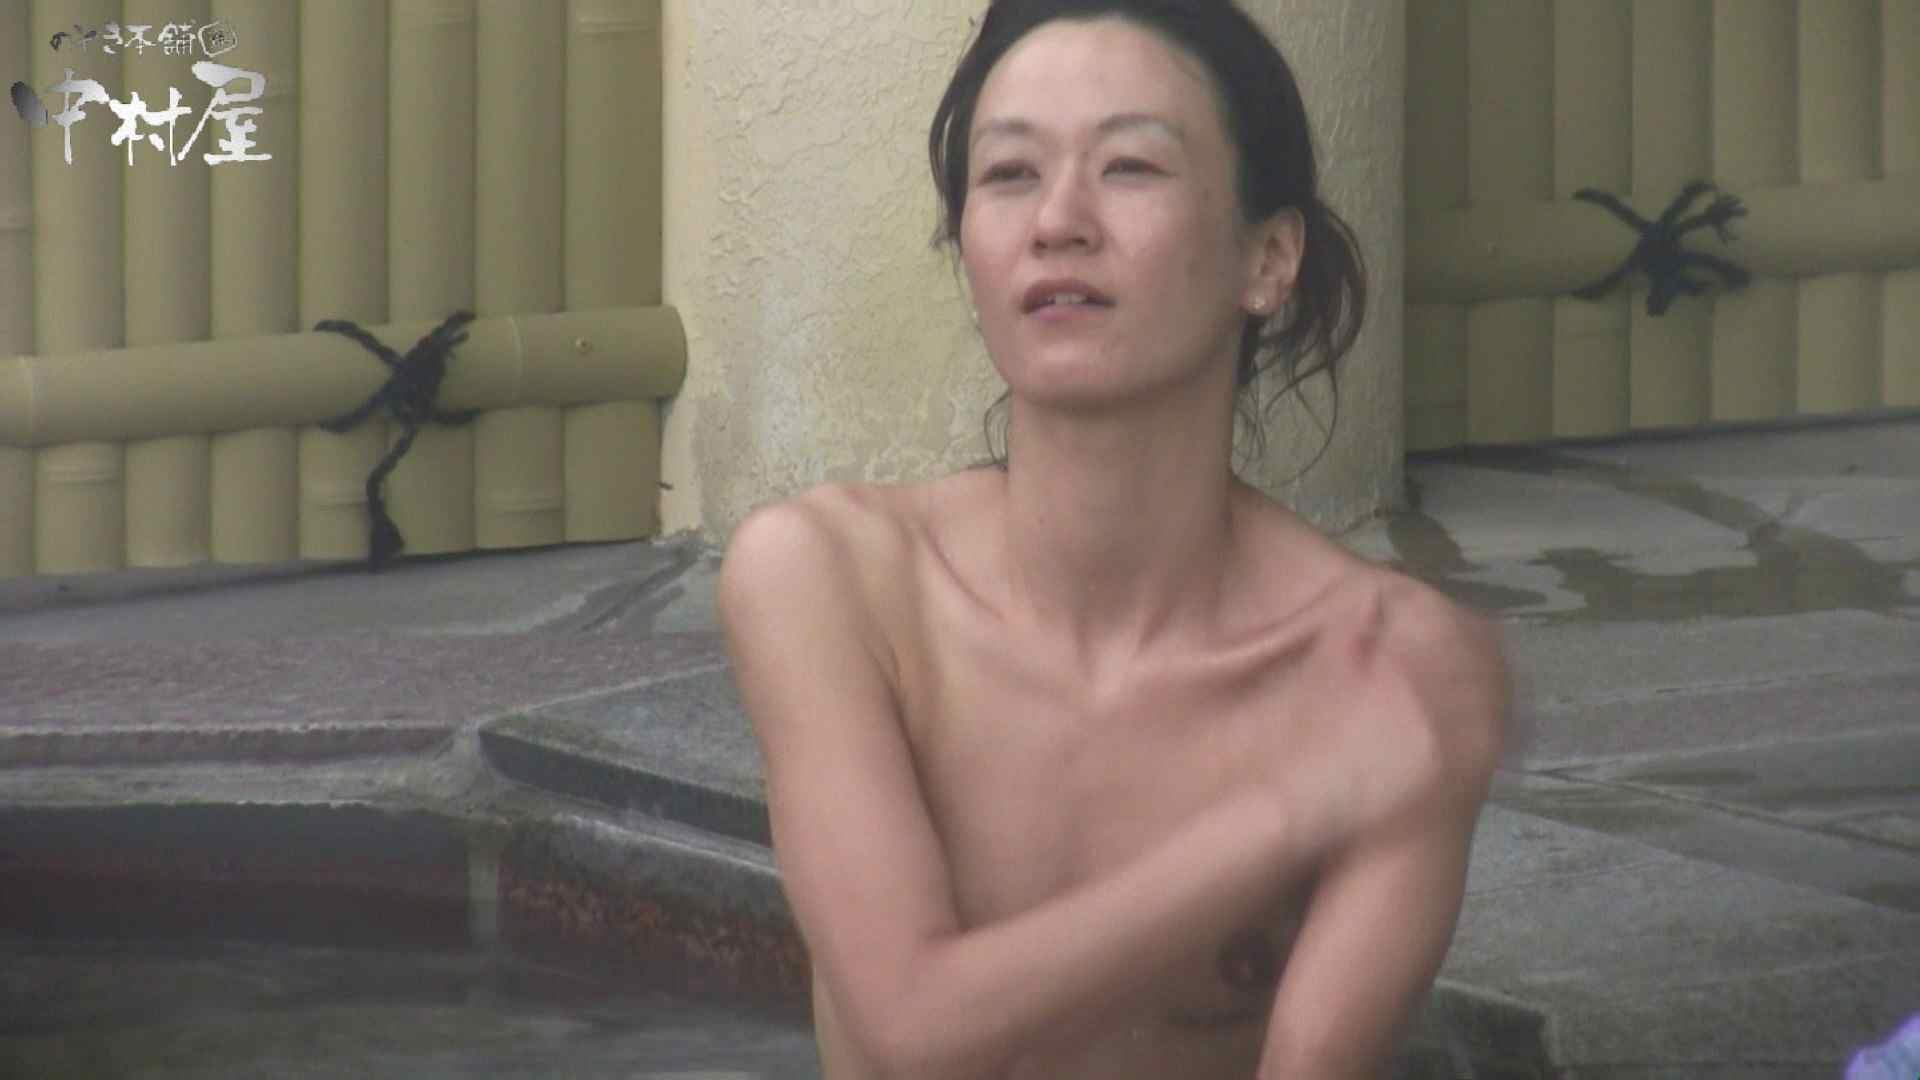 Aquaな露天風呂Vol.928 露天風呂突入 | 盗撮師作品  72pic 40